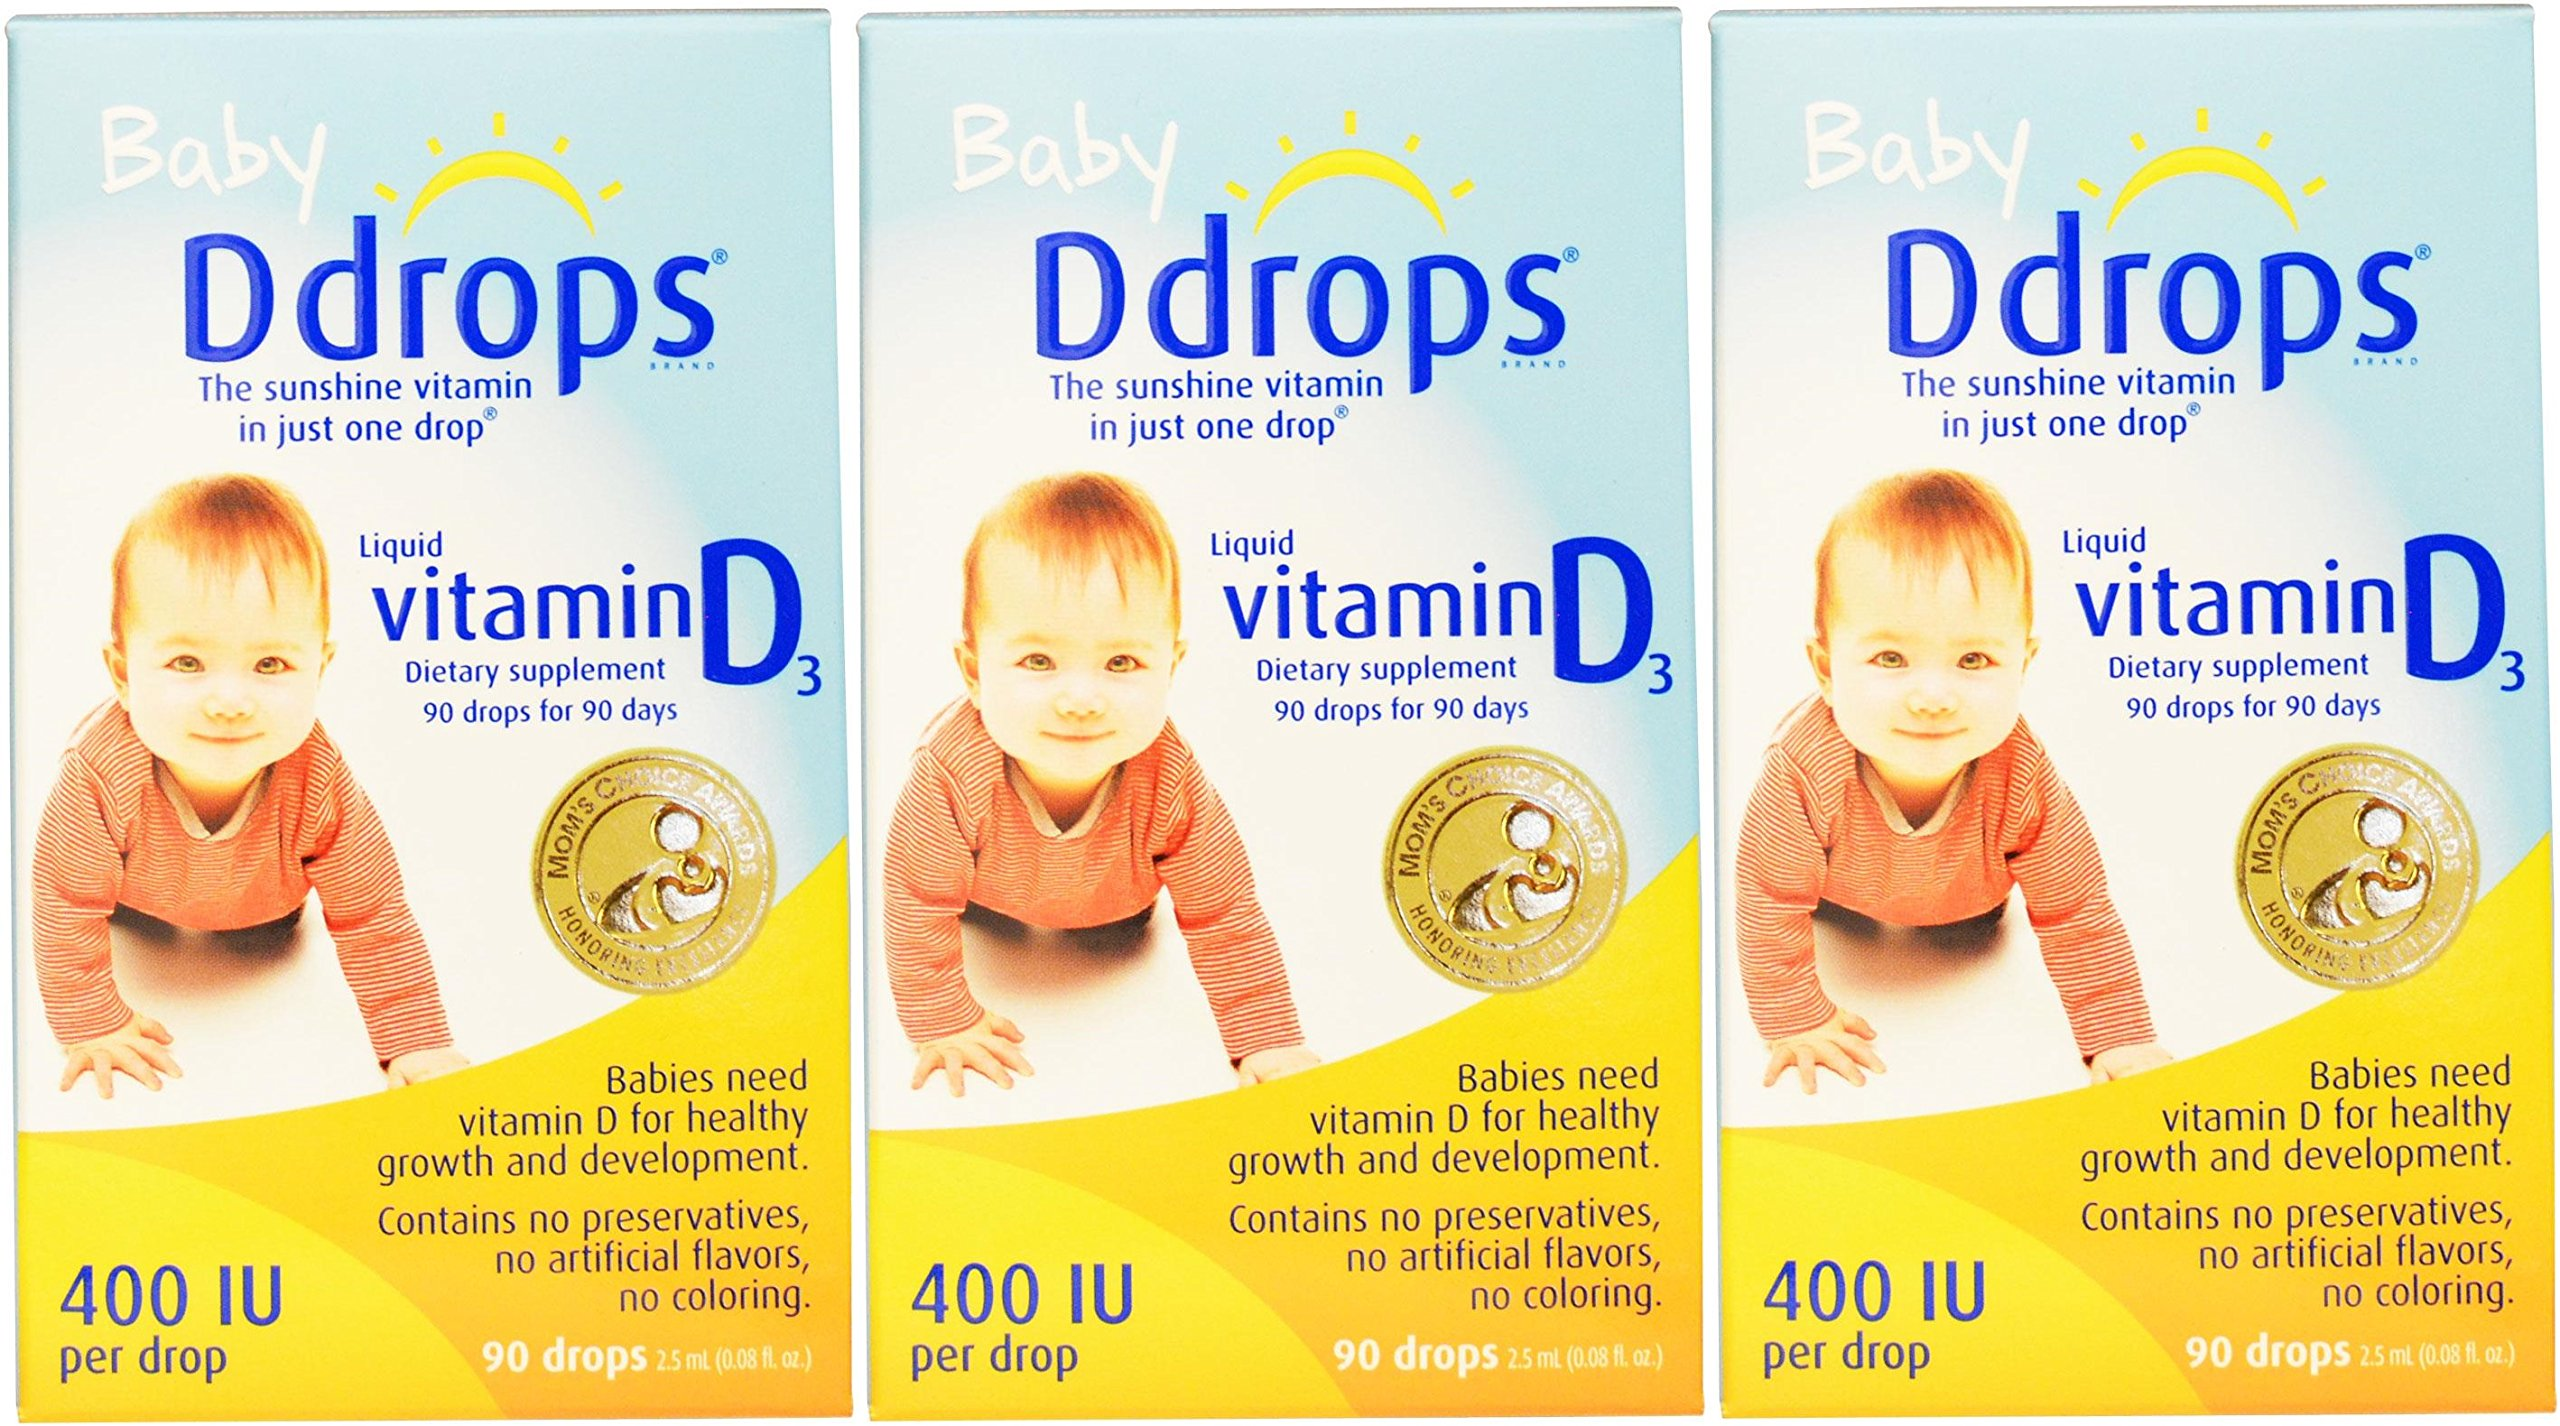 Baby Ddrops 400 IU 90 Drops (Pack of 3)